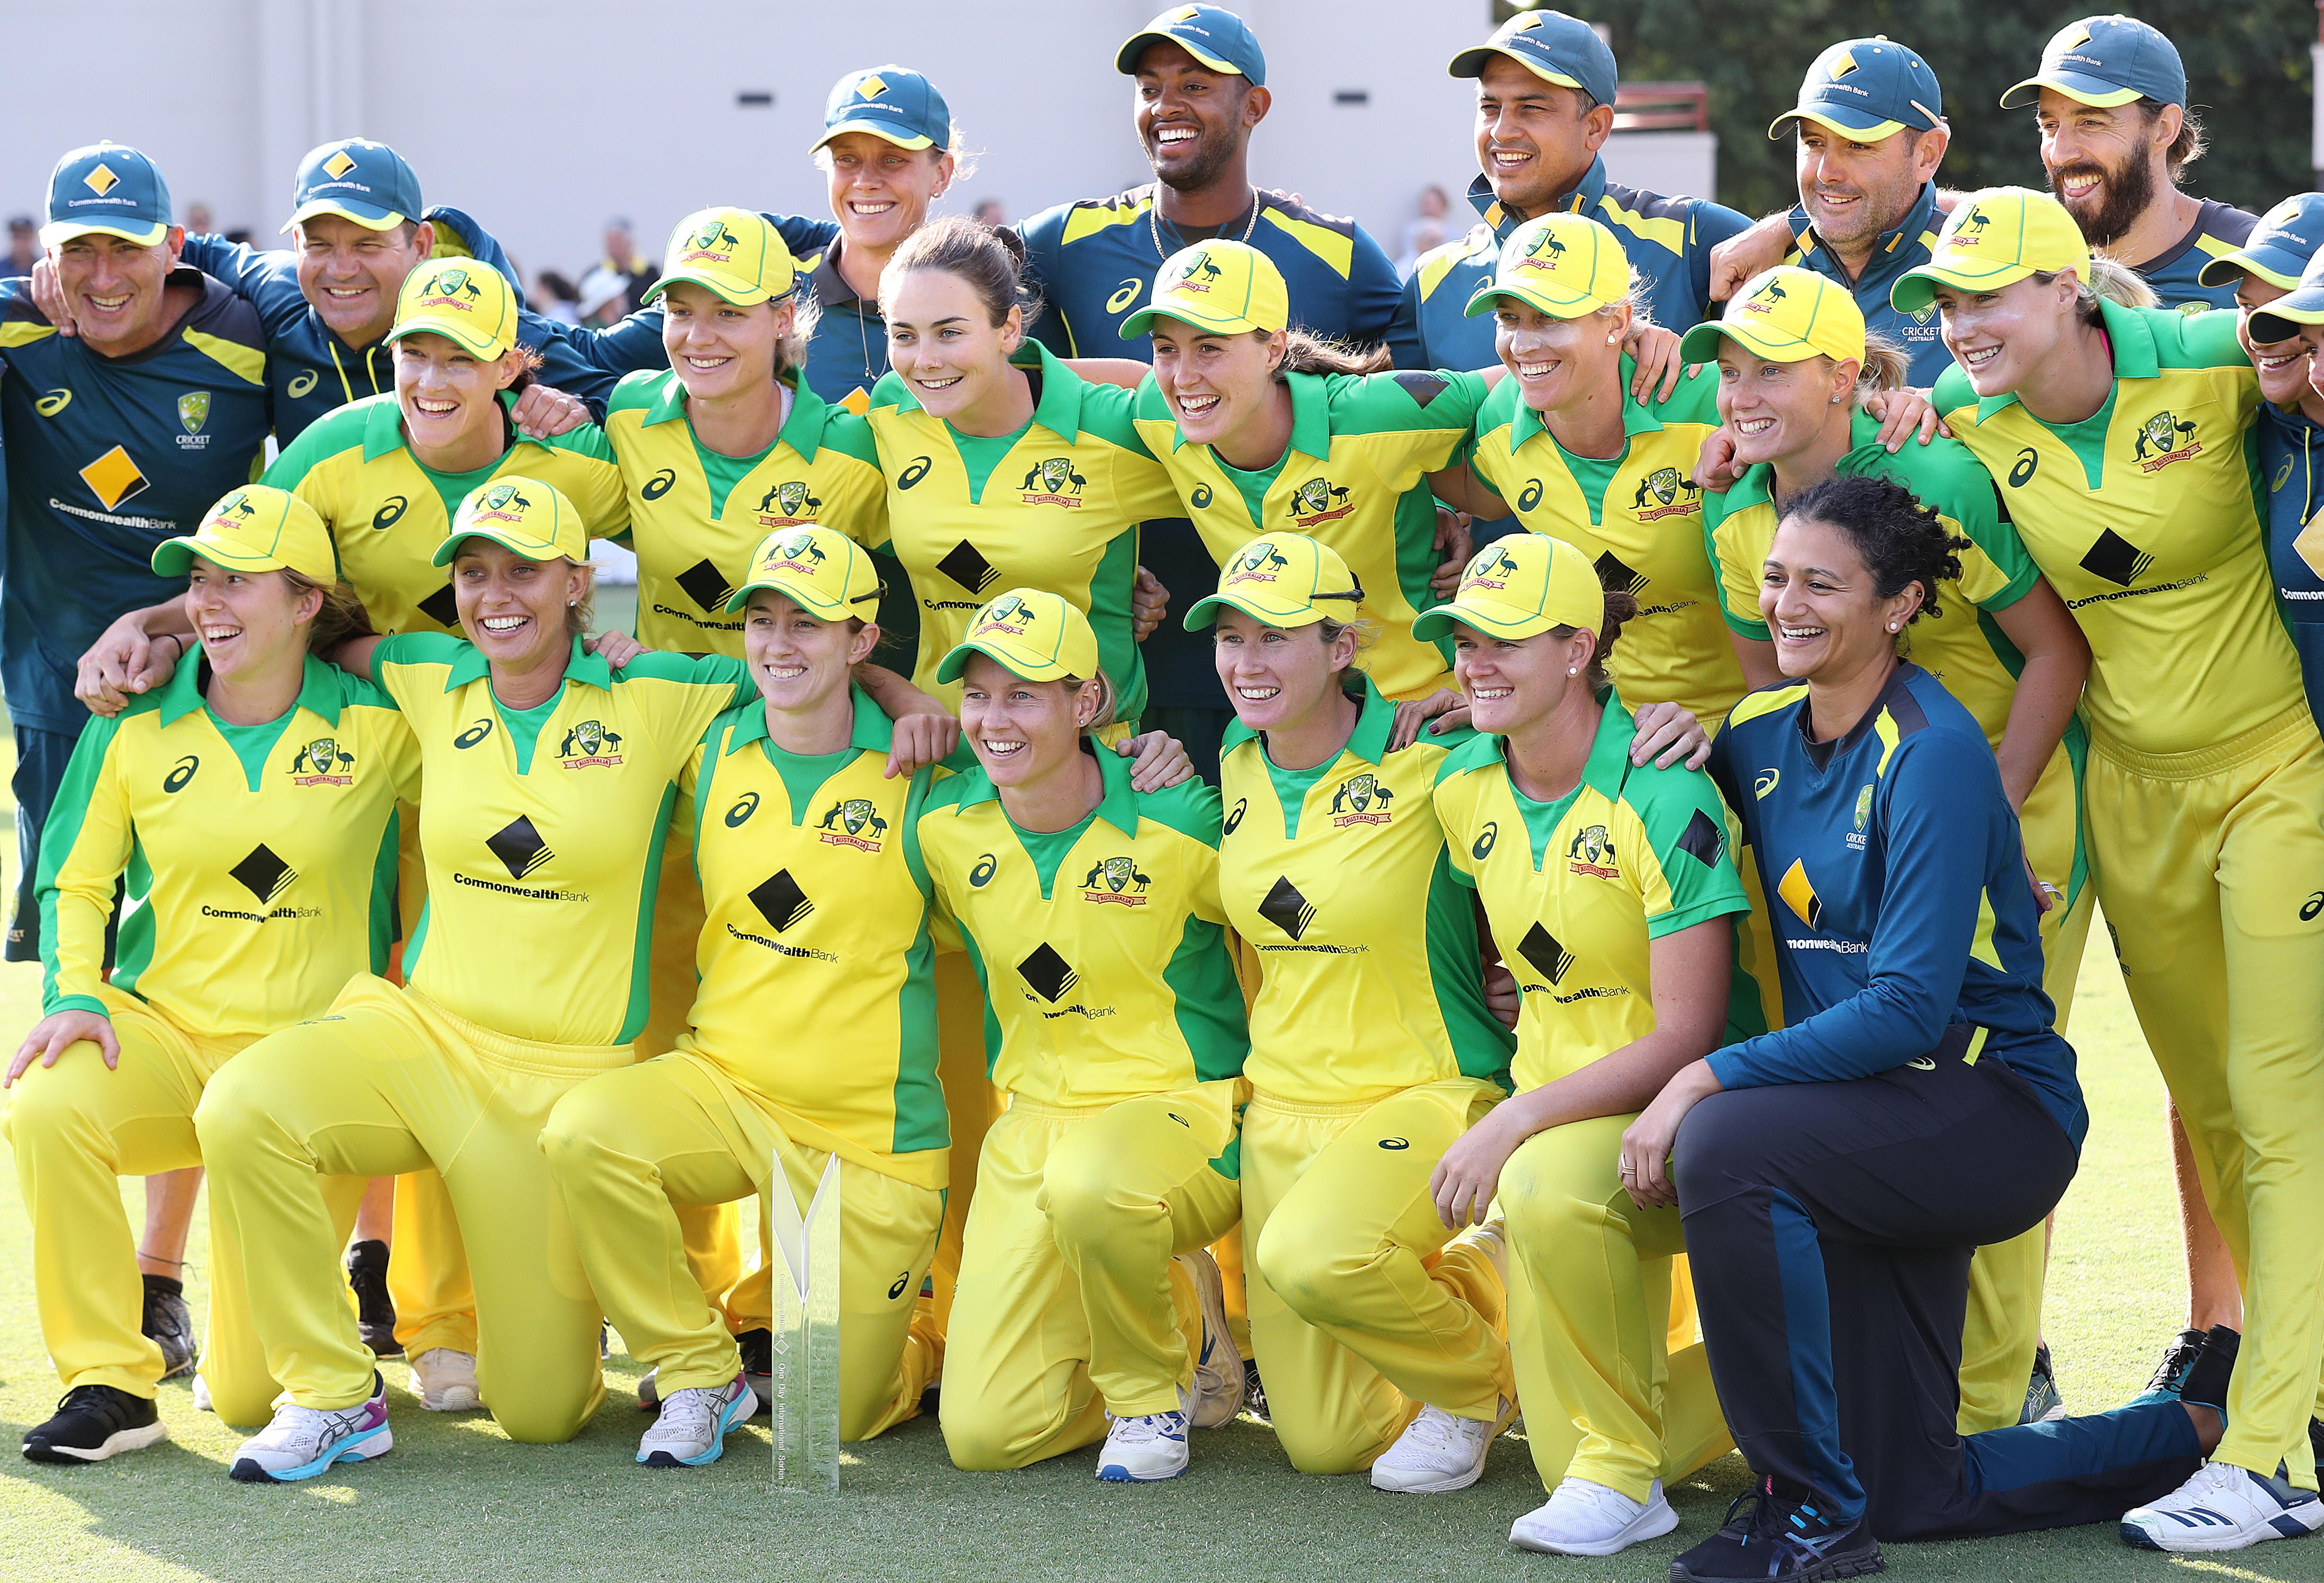 IN PICS: Australia's record streak of 18* wins in WODIs